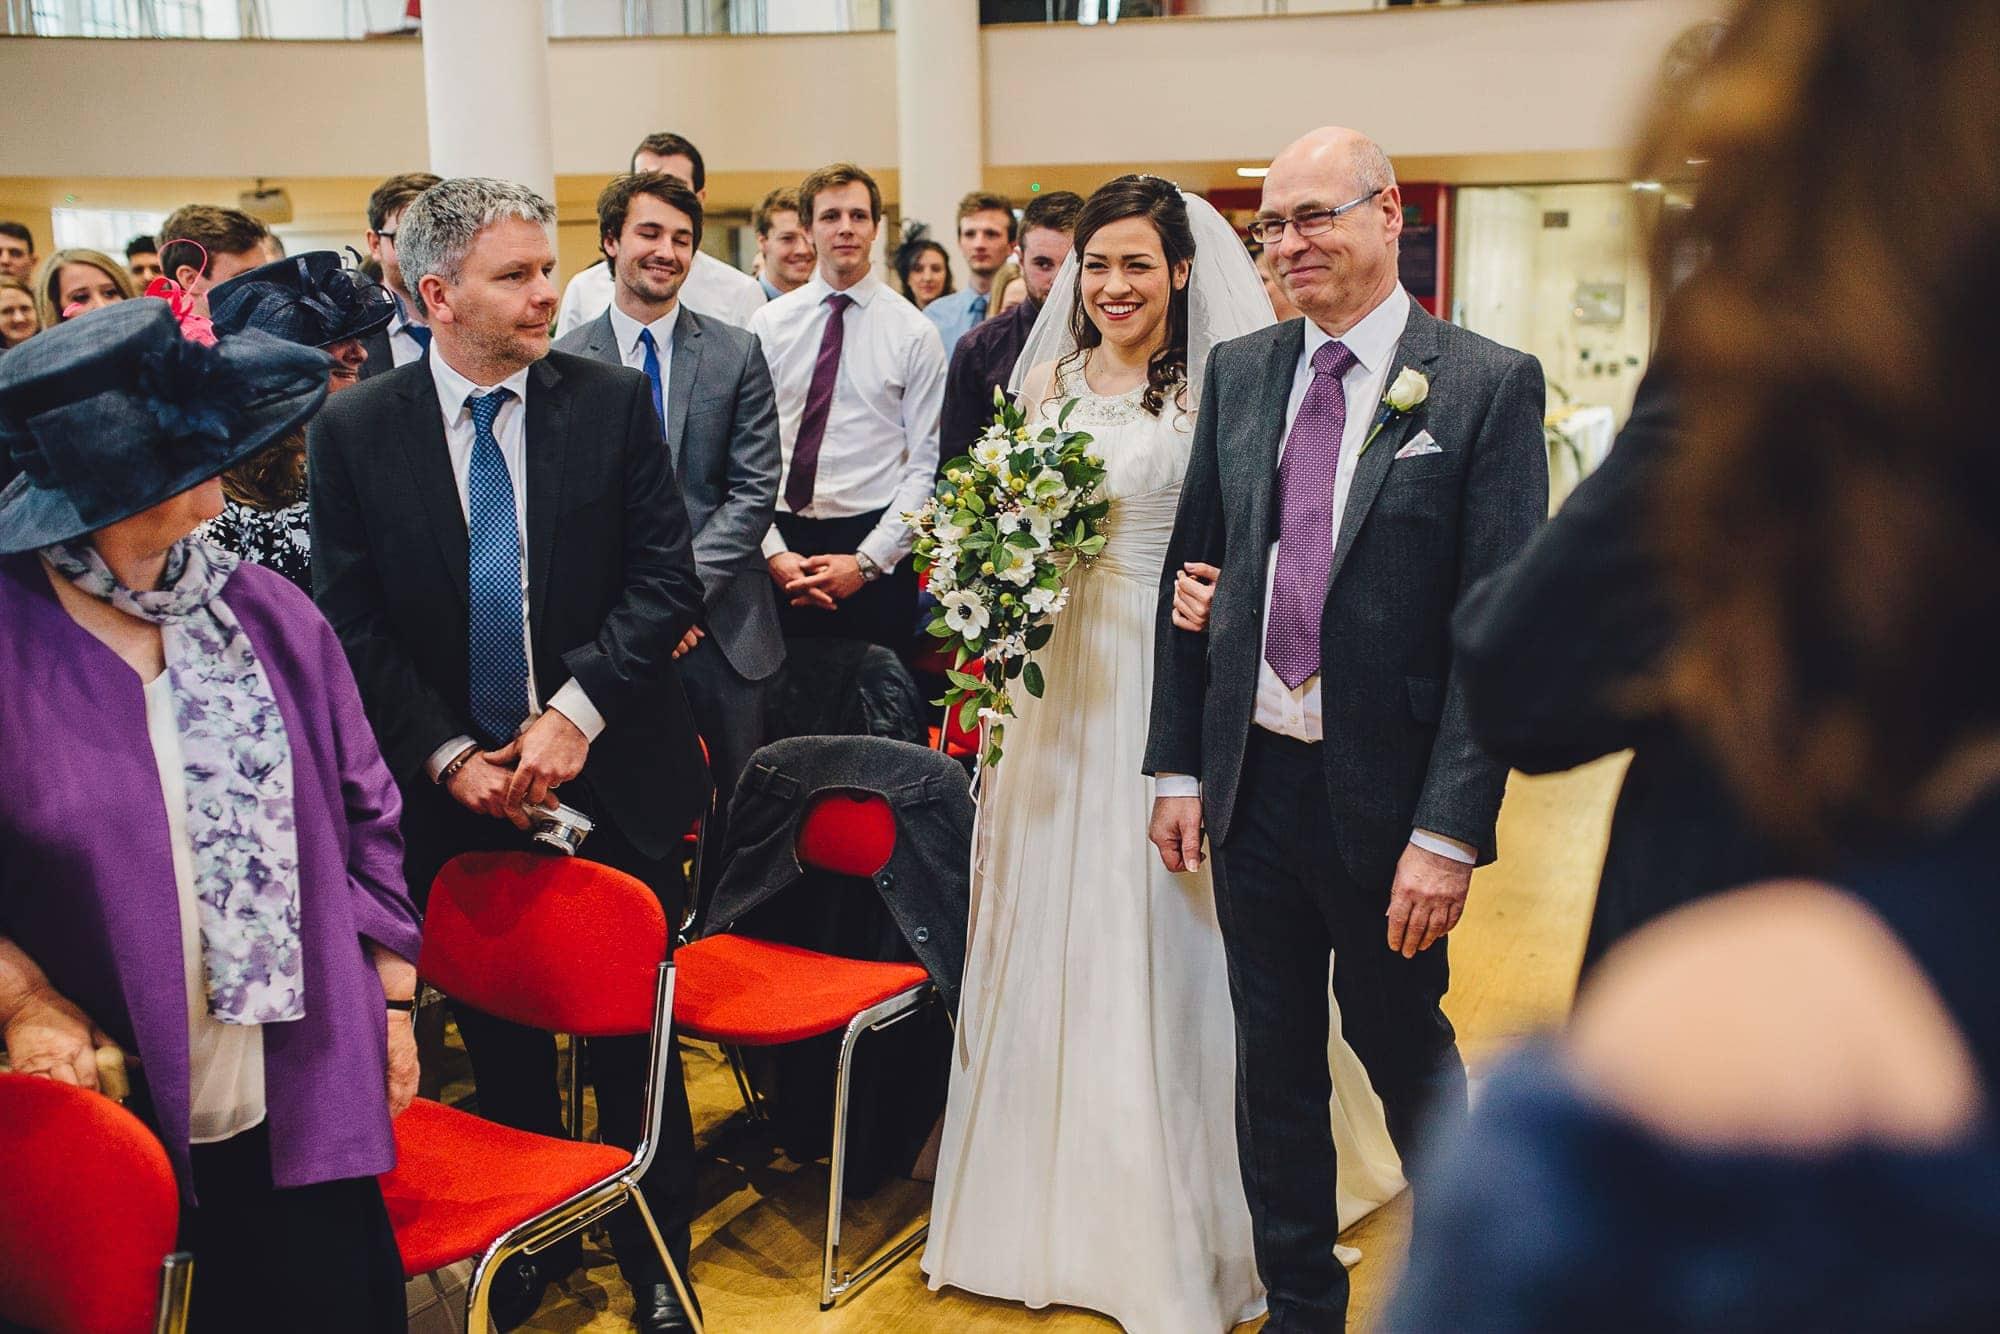 Matlt-Cross-Nottingham-wedding-Photography-26